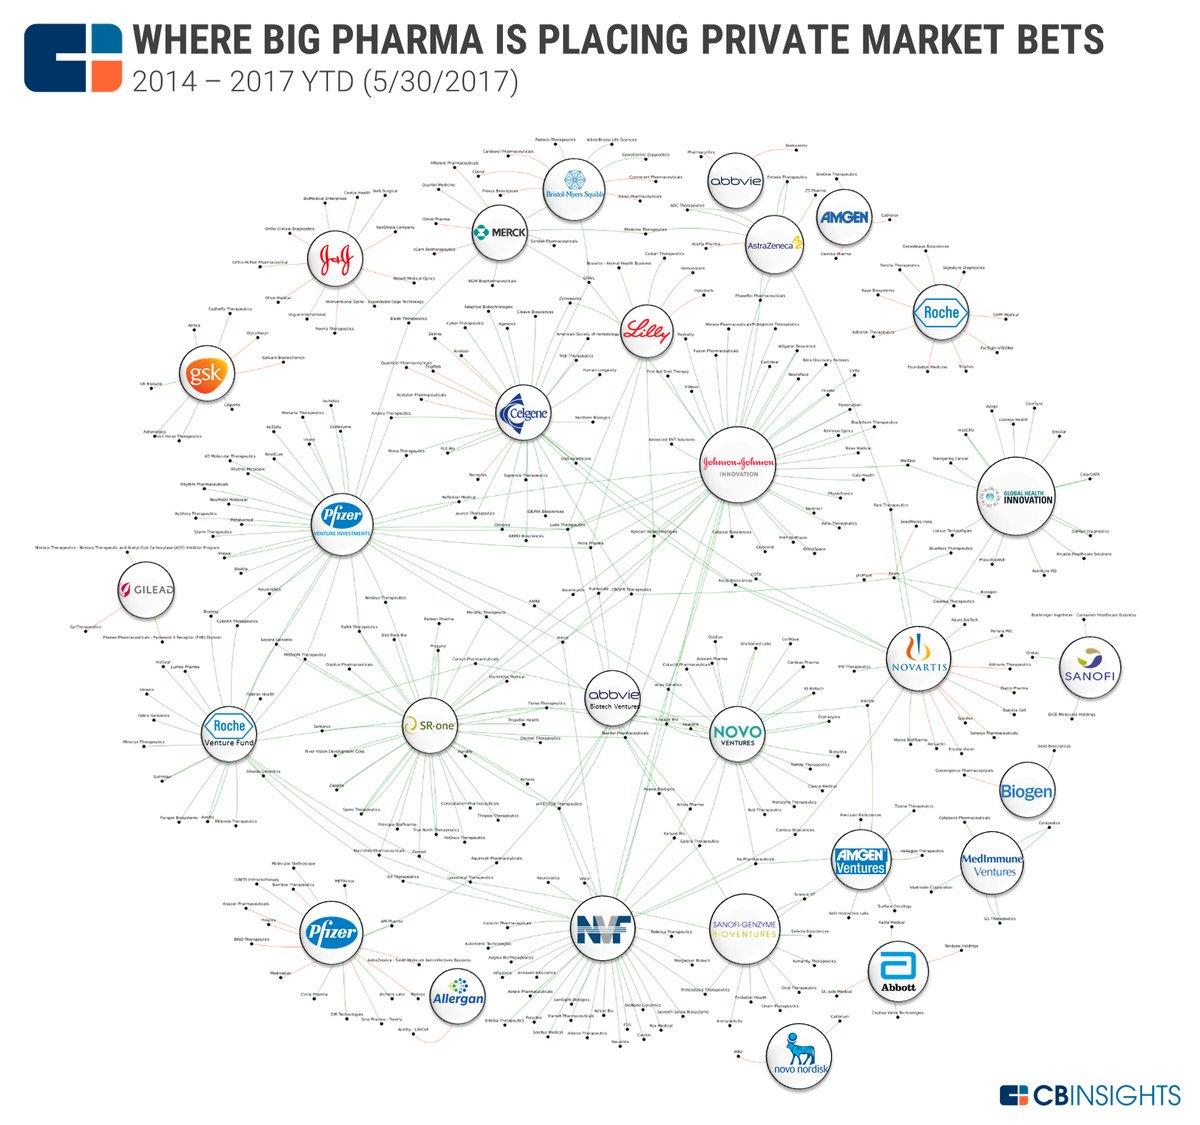 #BigPharma&#39;s #Investments Across #Genomics #Biotech &amp; #DigitalHealth - #fintech #genetics #crispr #pharma #biotechnology @BourseetTrading<br>http://pic.twitter.com/oYJ2ymzXrO